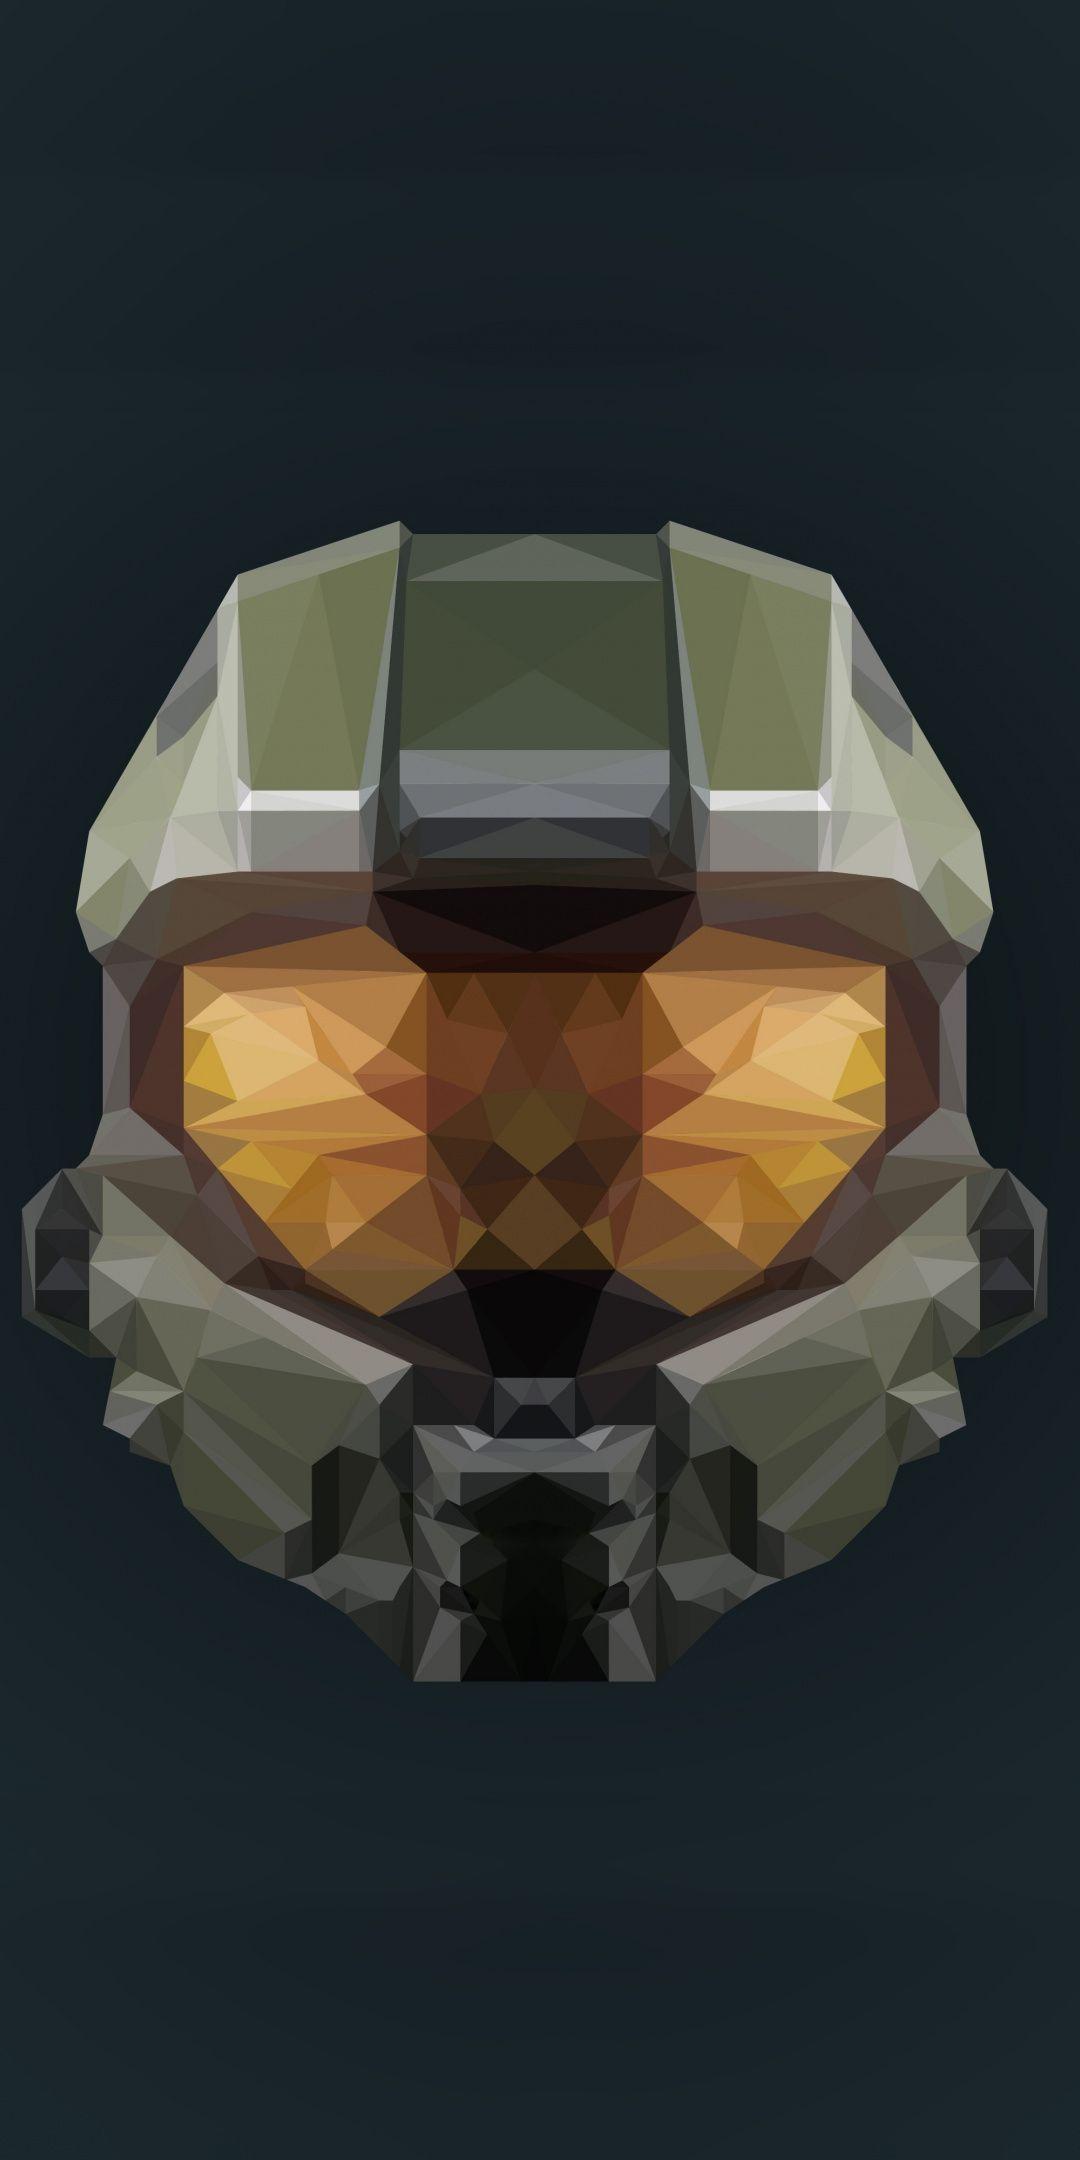 Helmet Halo Infinite Artwork Low Poly 1080x2160